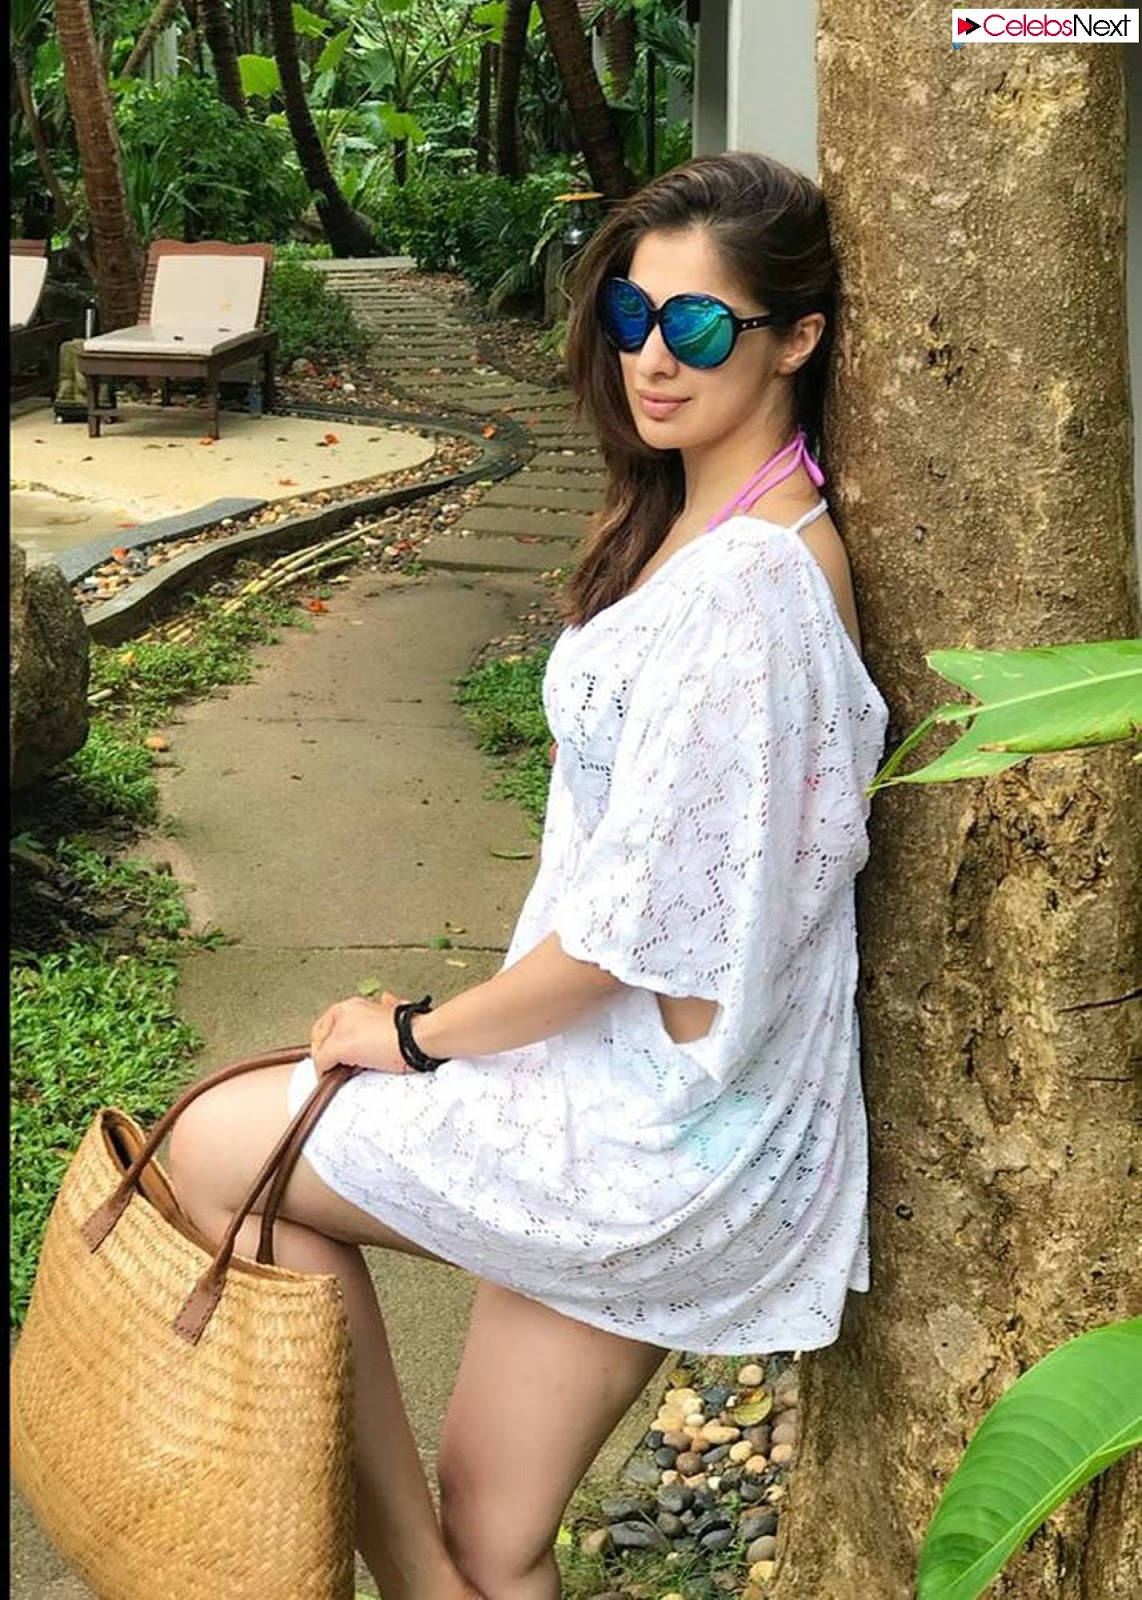 Raai Laxmi Enjoying vacation in Micro Mini Dress Candid Pics